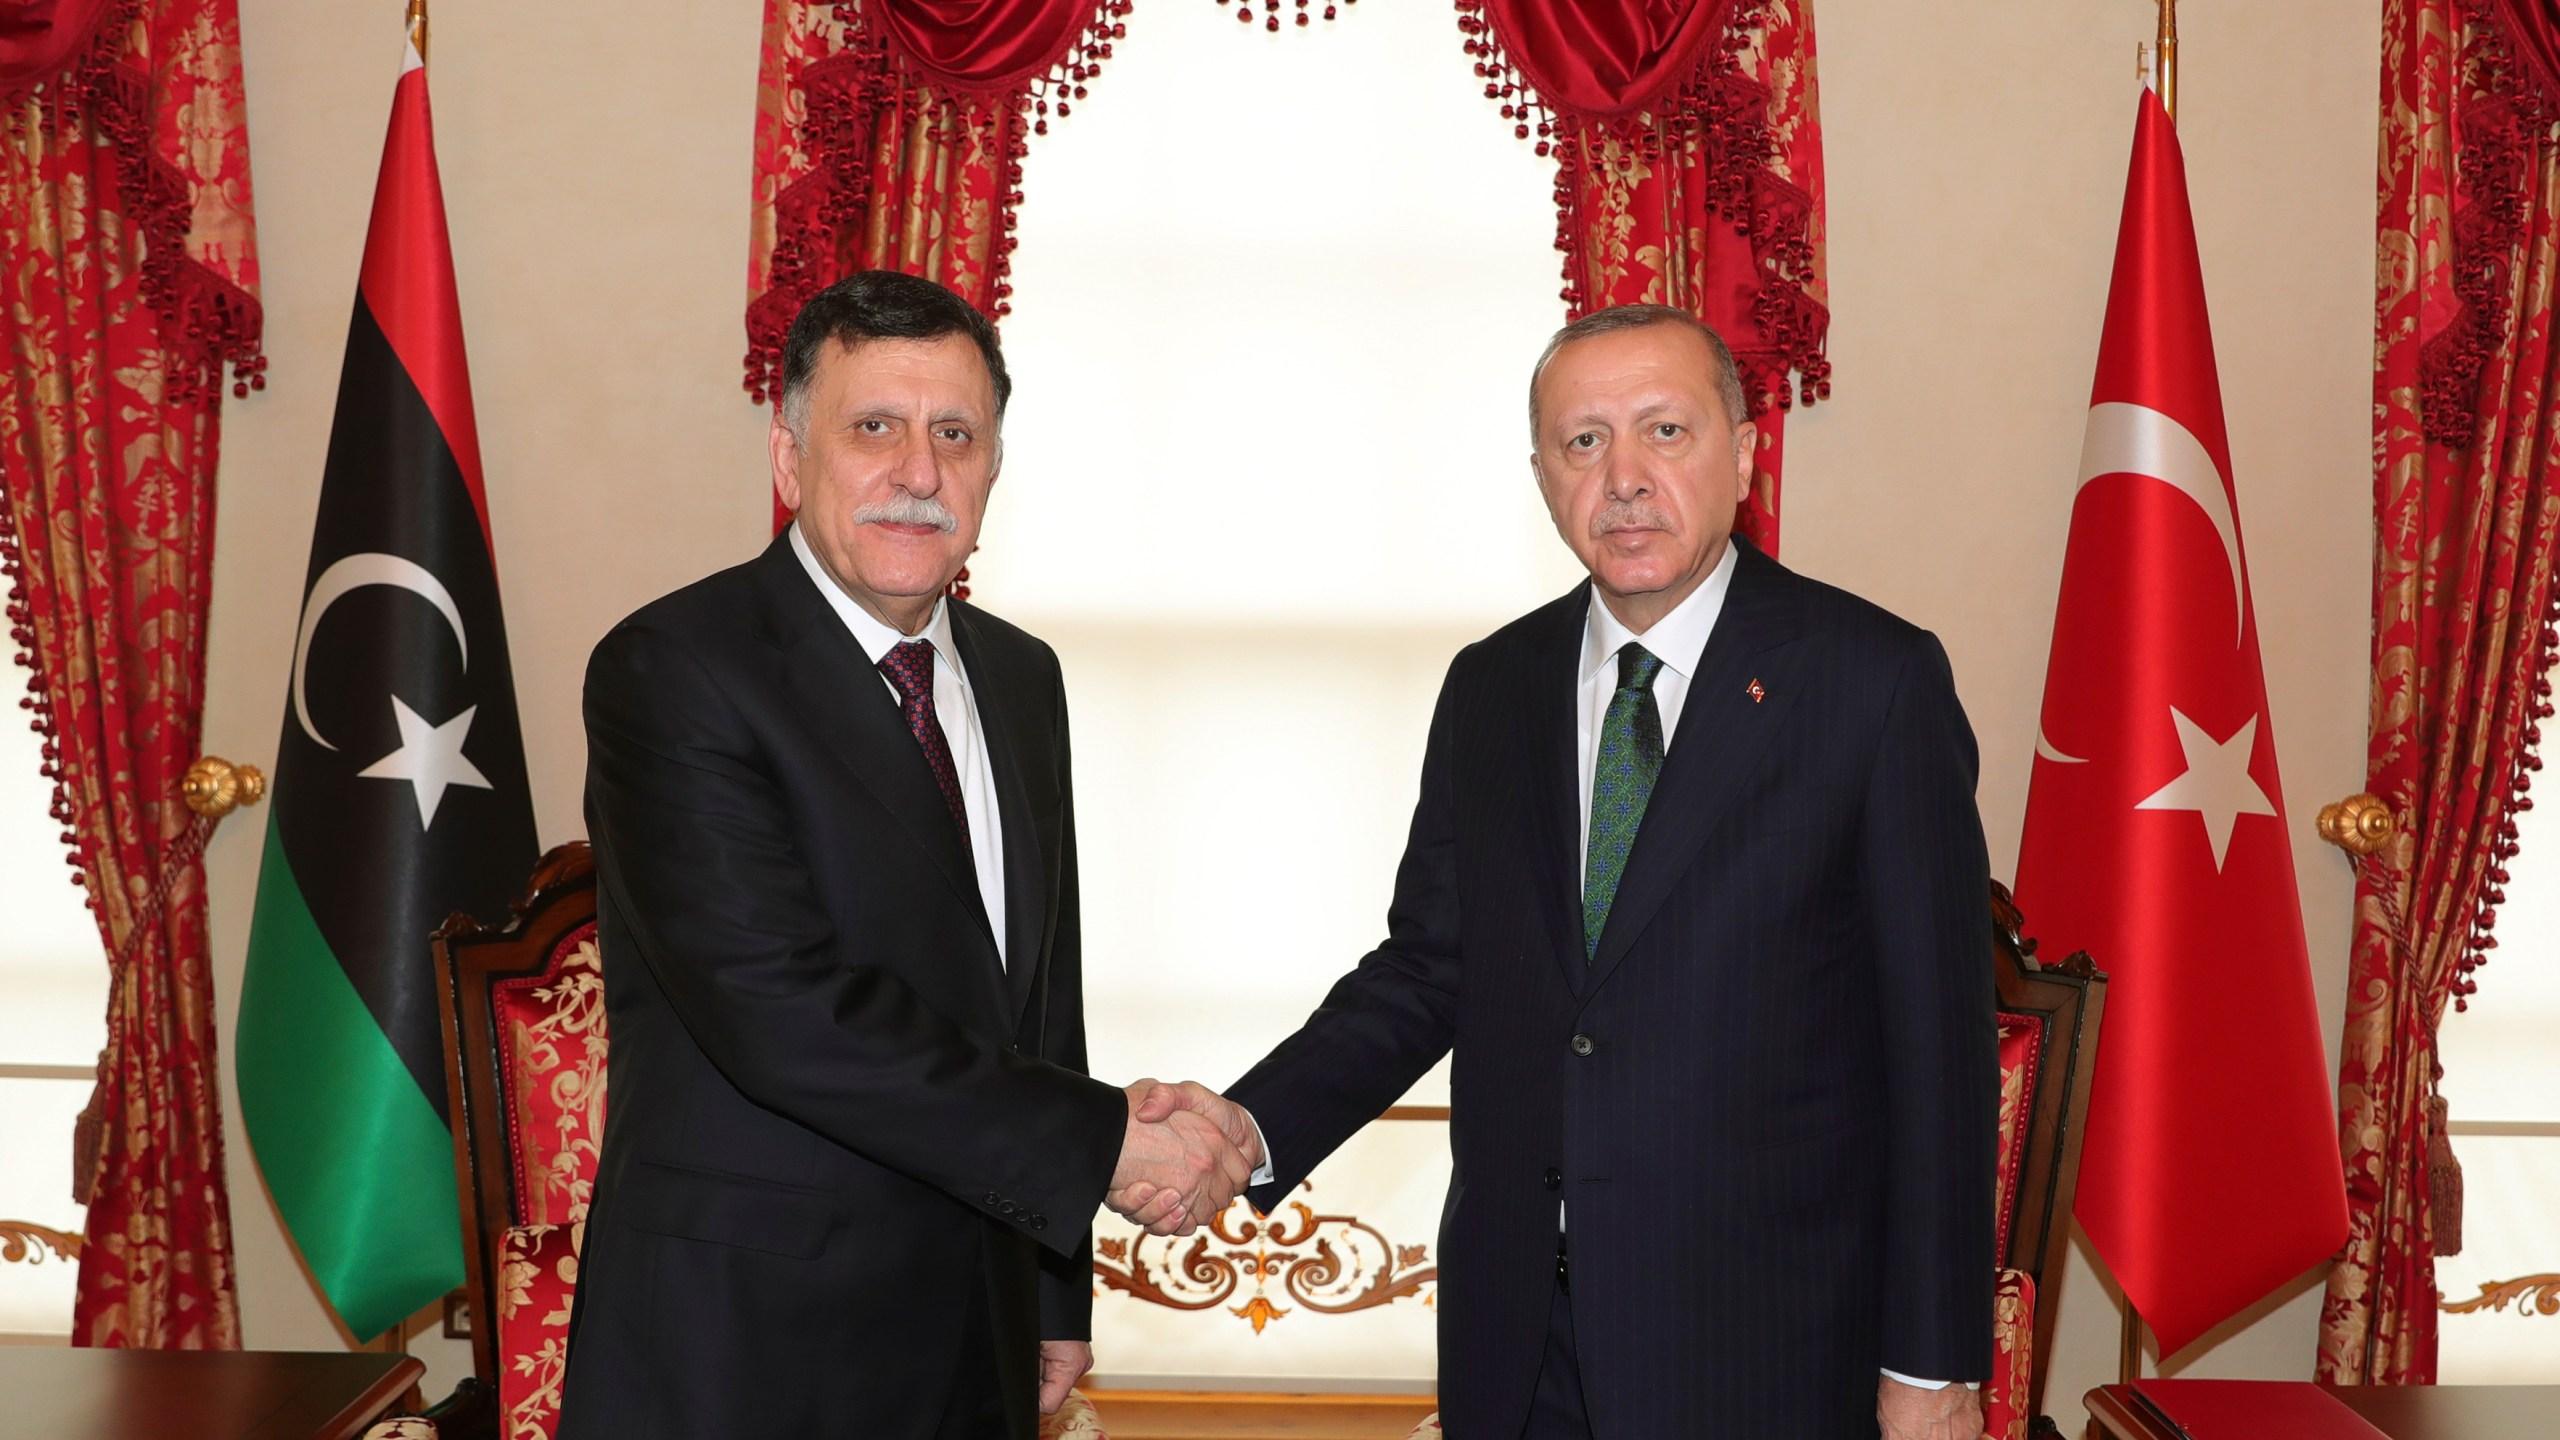 Recep Tayyip Erdogan, Fayez Sarraj